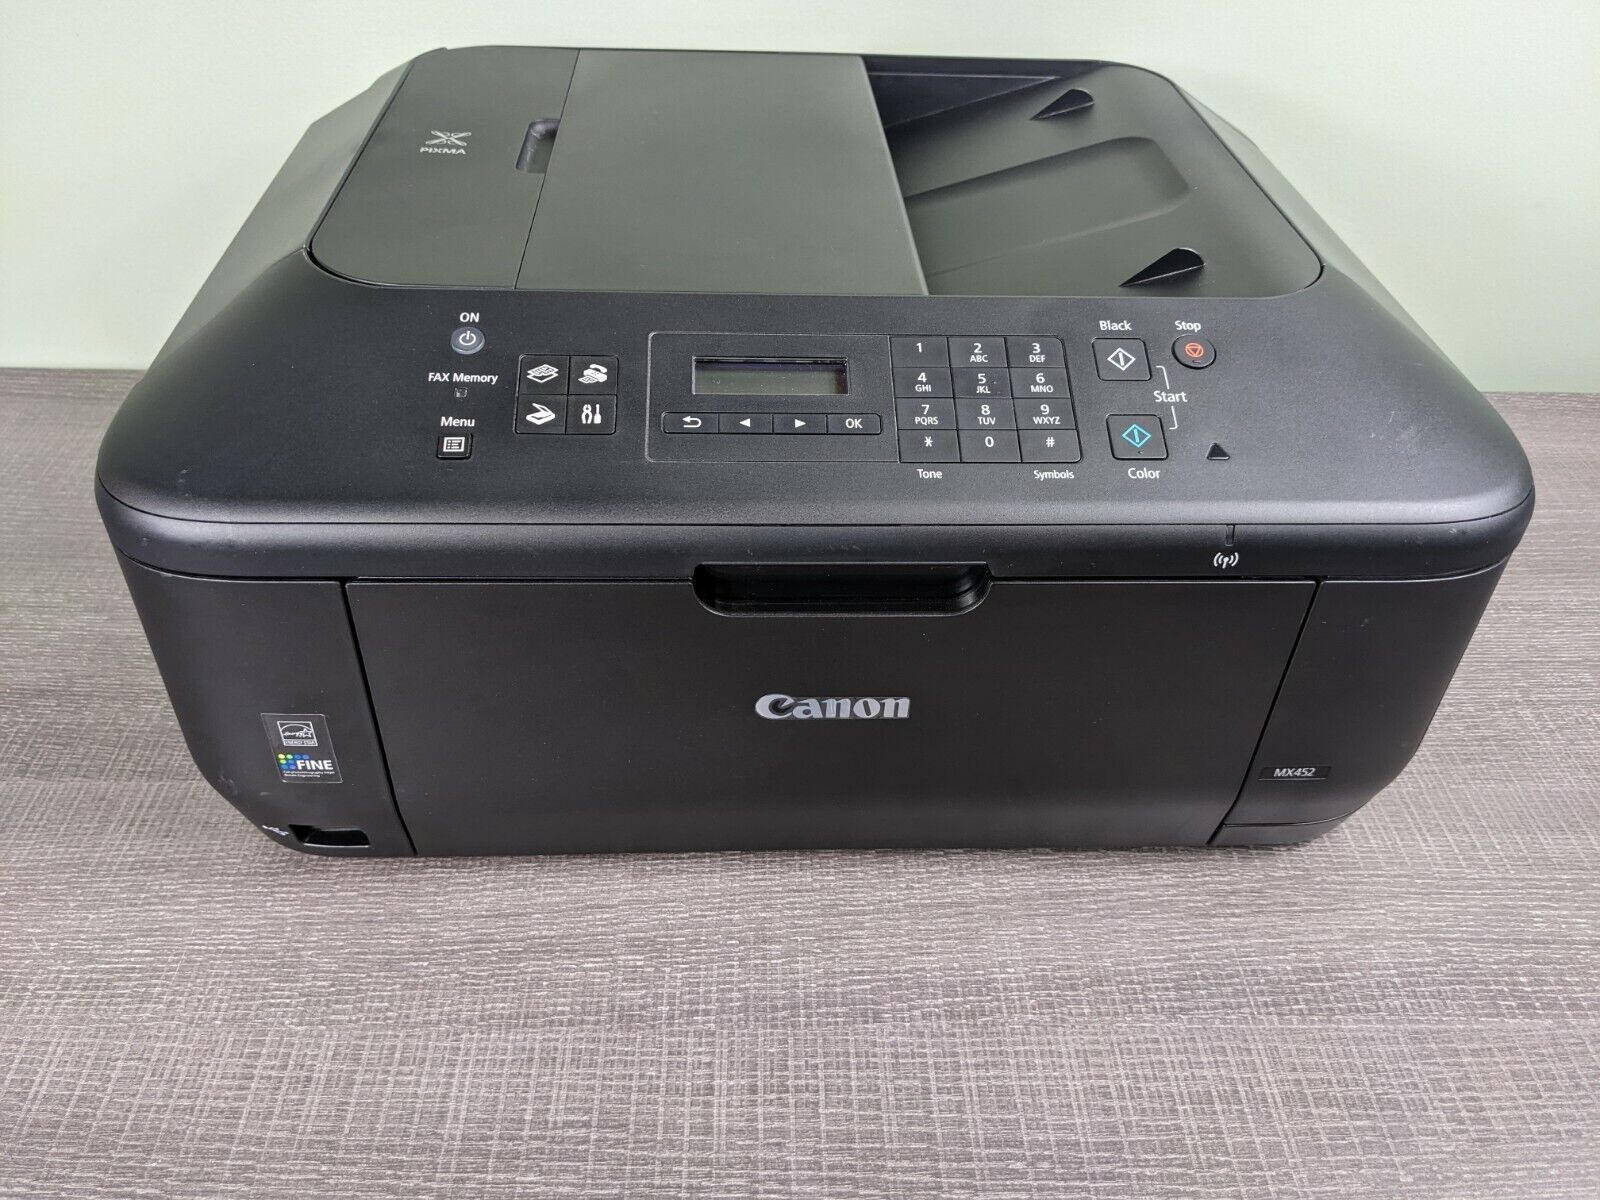 canon mx452 all-in-one inkjet printer for sale online | ebay  ebay